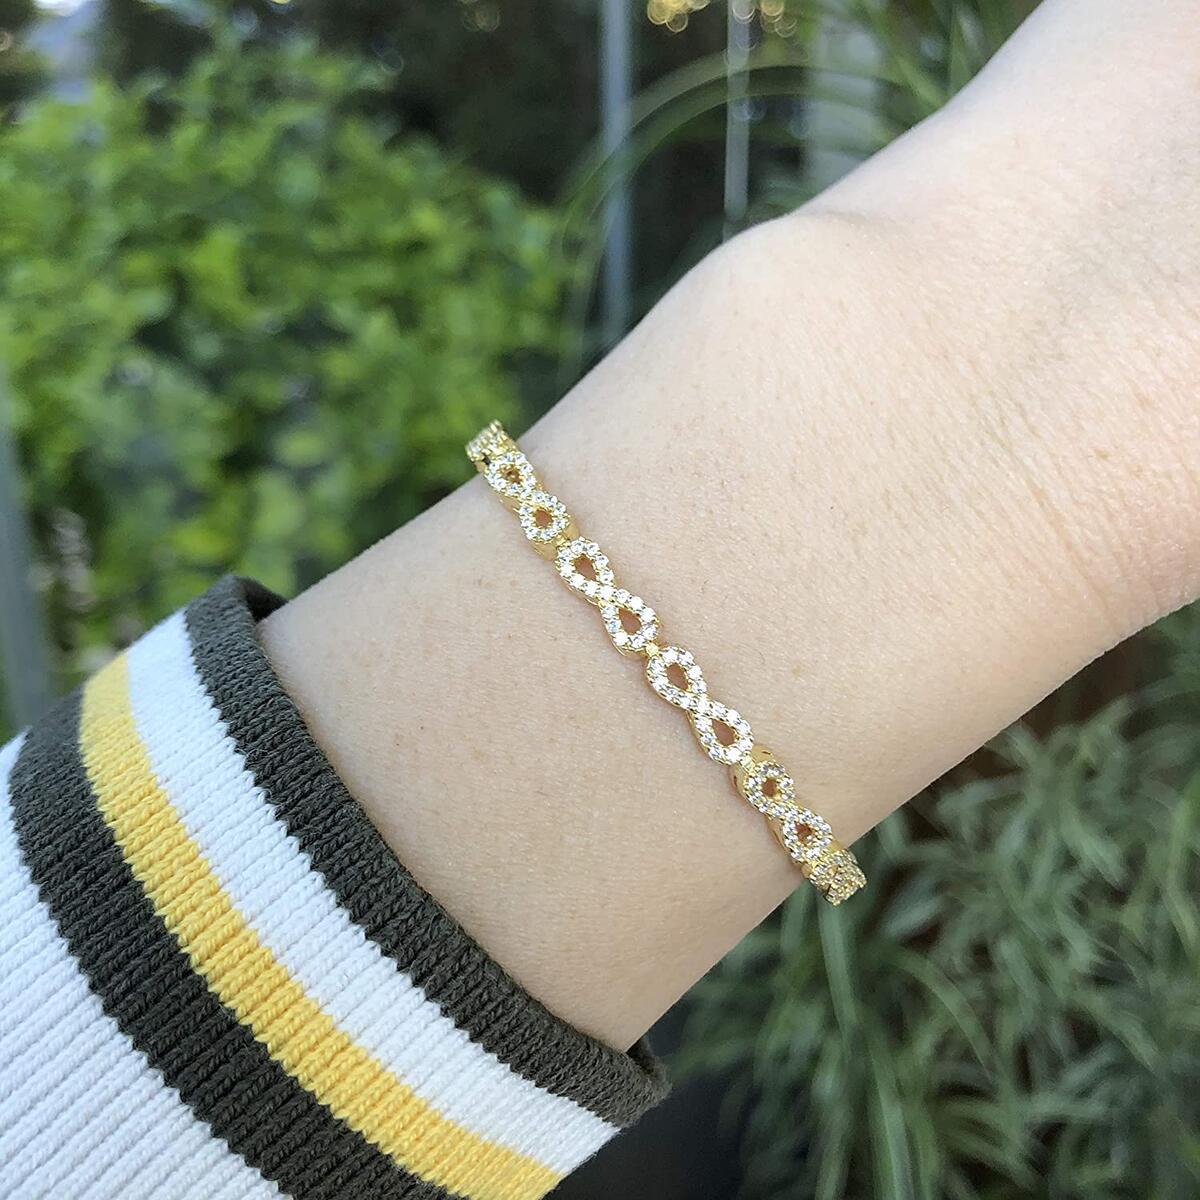 925 Sterling Silver Tennis Bracelets for Women, Rhodium Plated Elegant Design Cubic Zirconia CZ Adjustable Bracelets for Women, Strand Sliding Tennis Bolo Bracelet (Infinity)